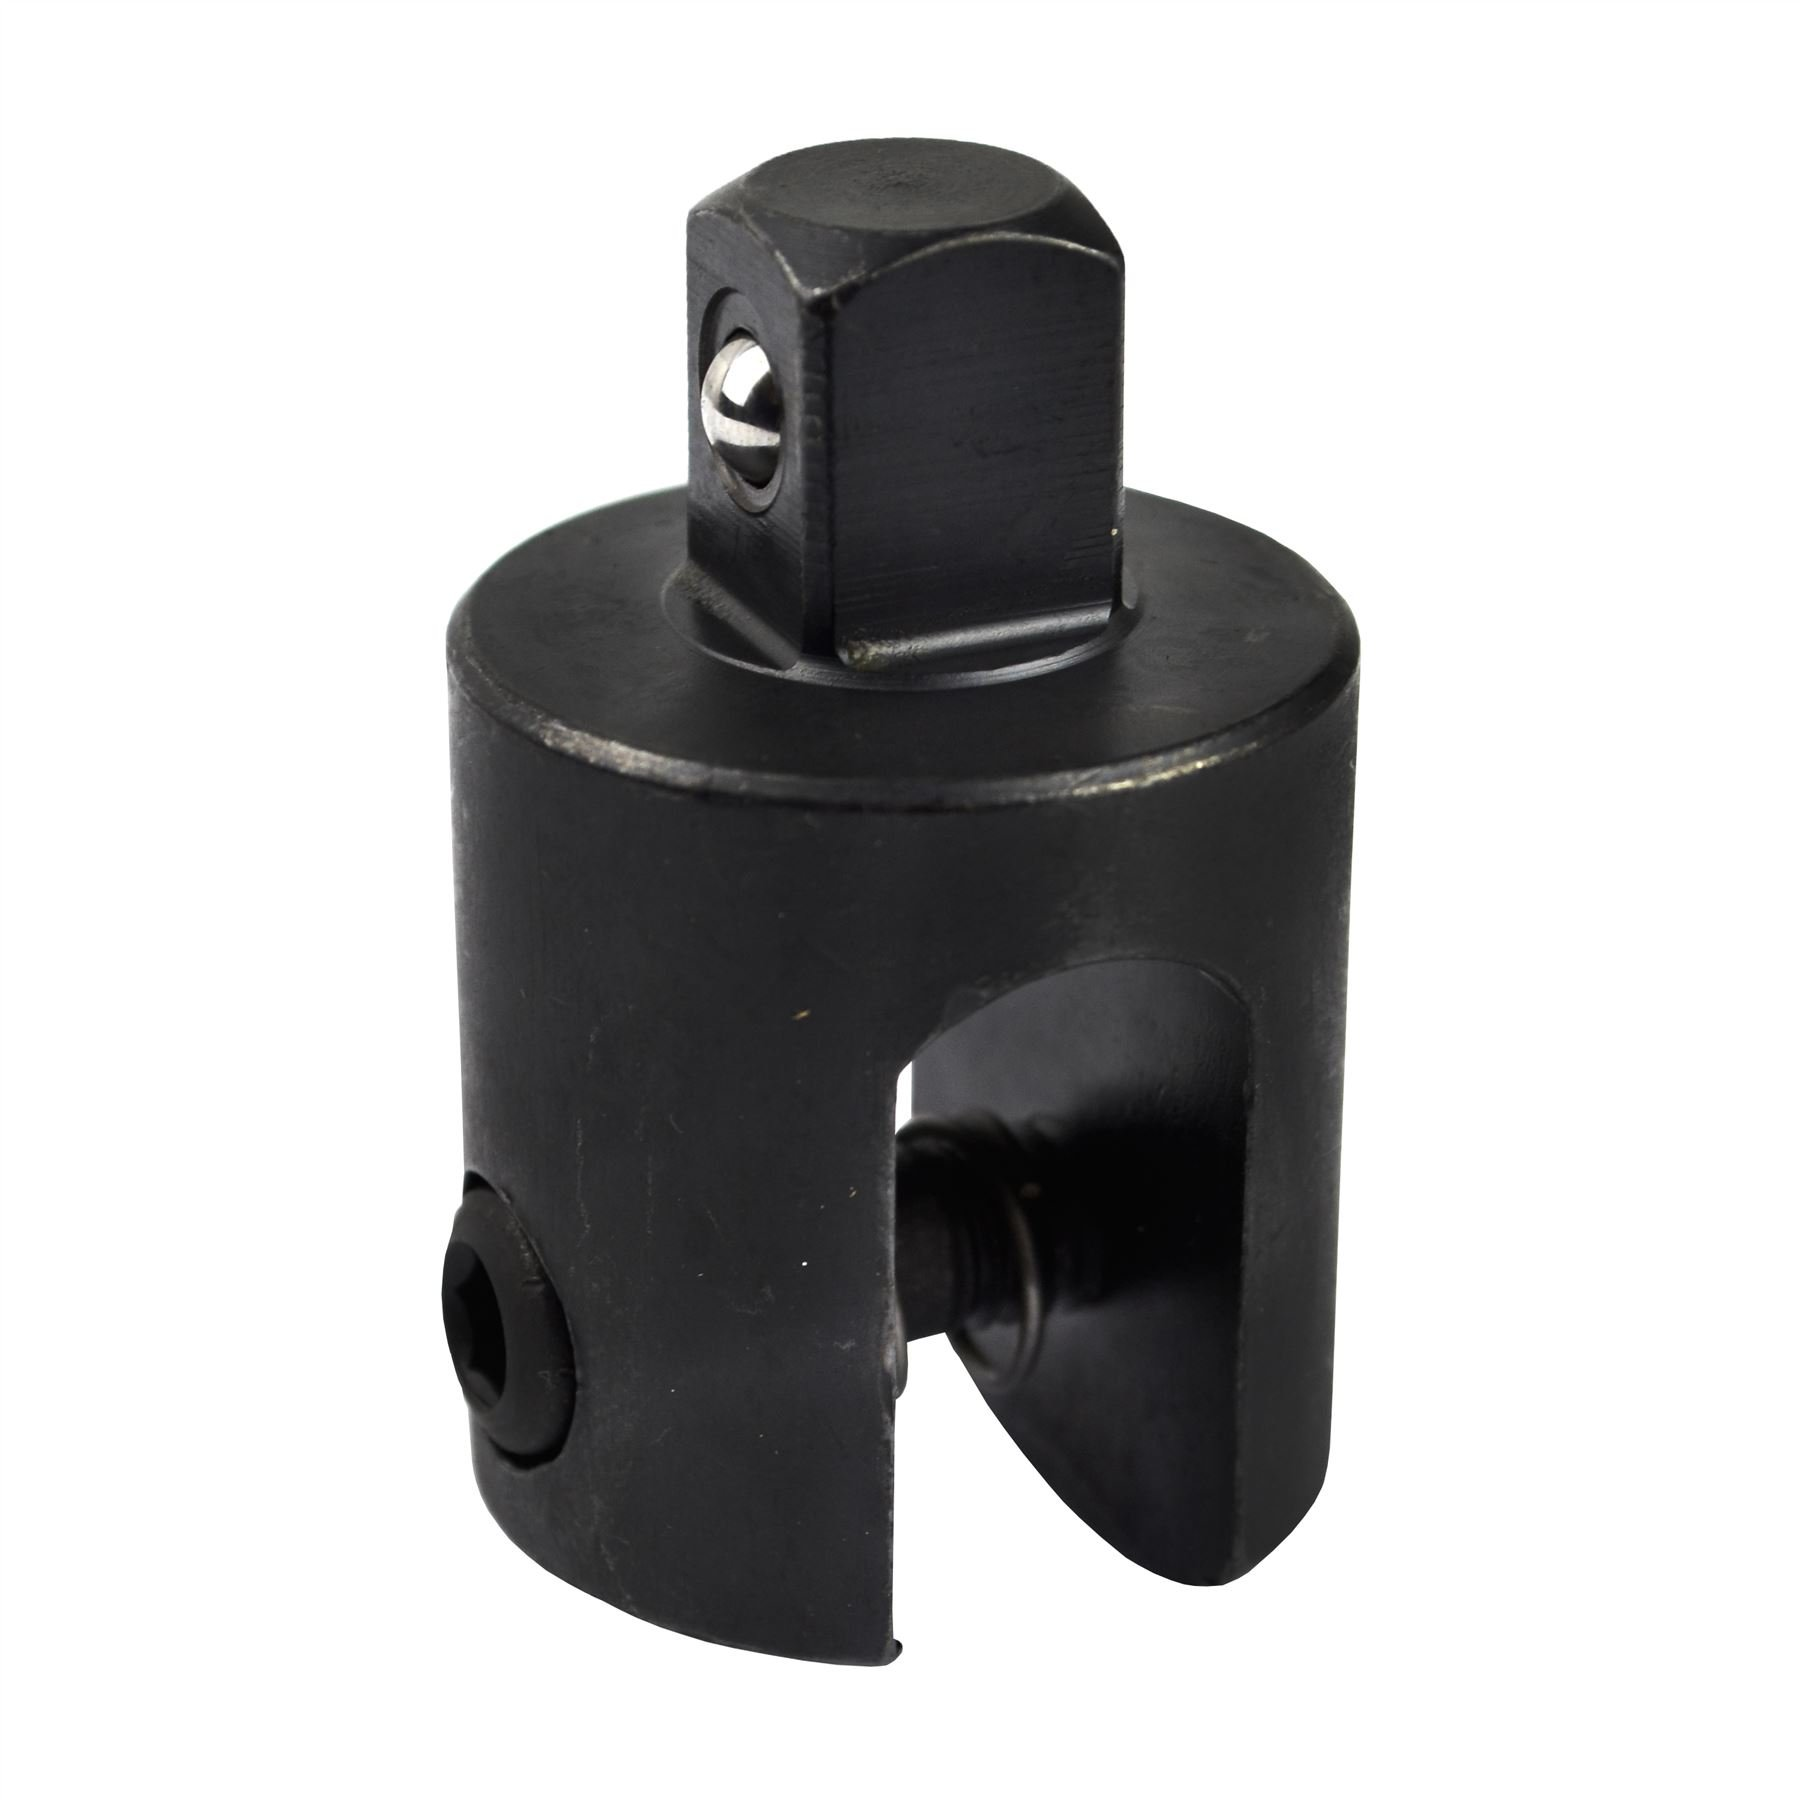 1/2'' Drive Power / Breaker / Knuckle Bar Replacement Head BERGEN AT143